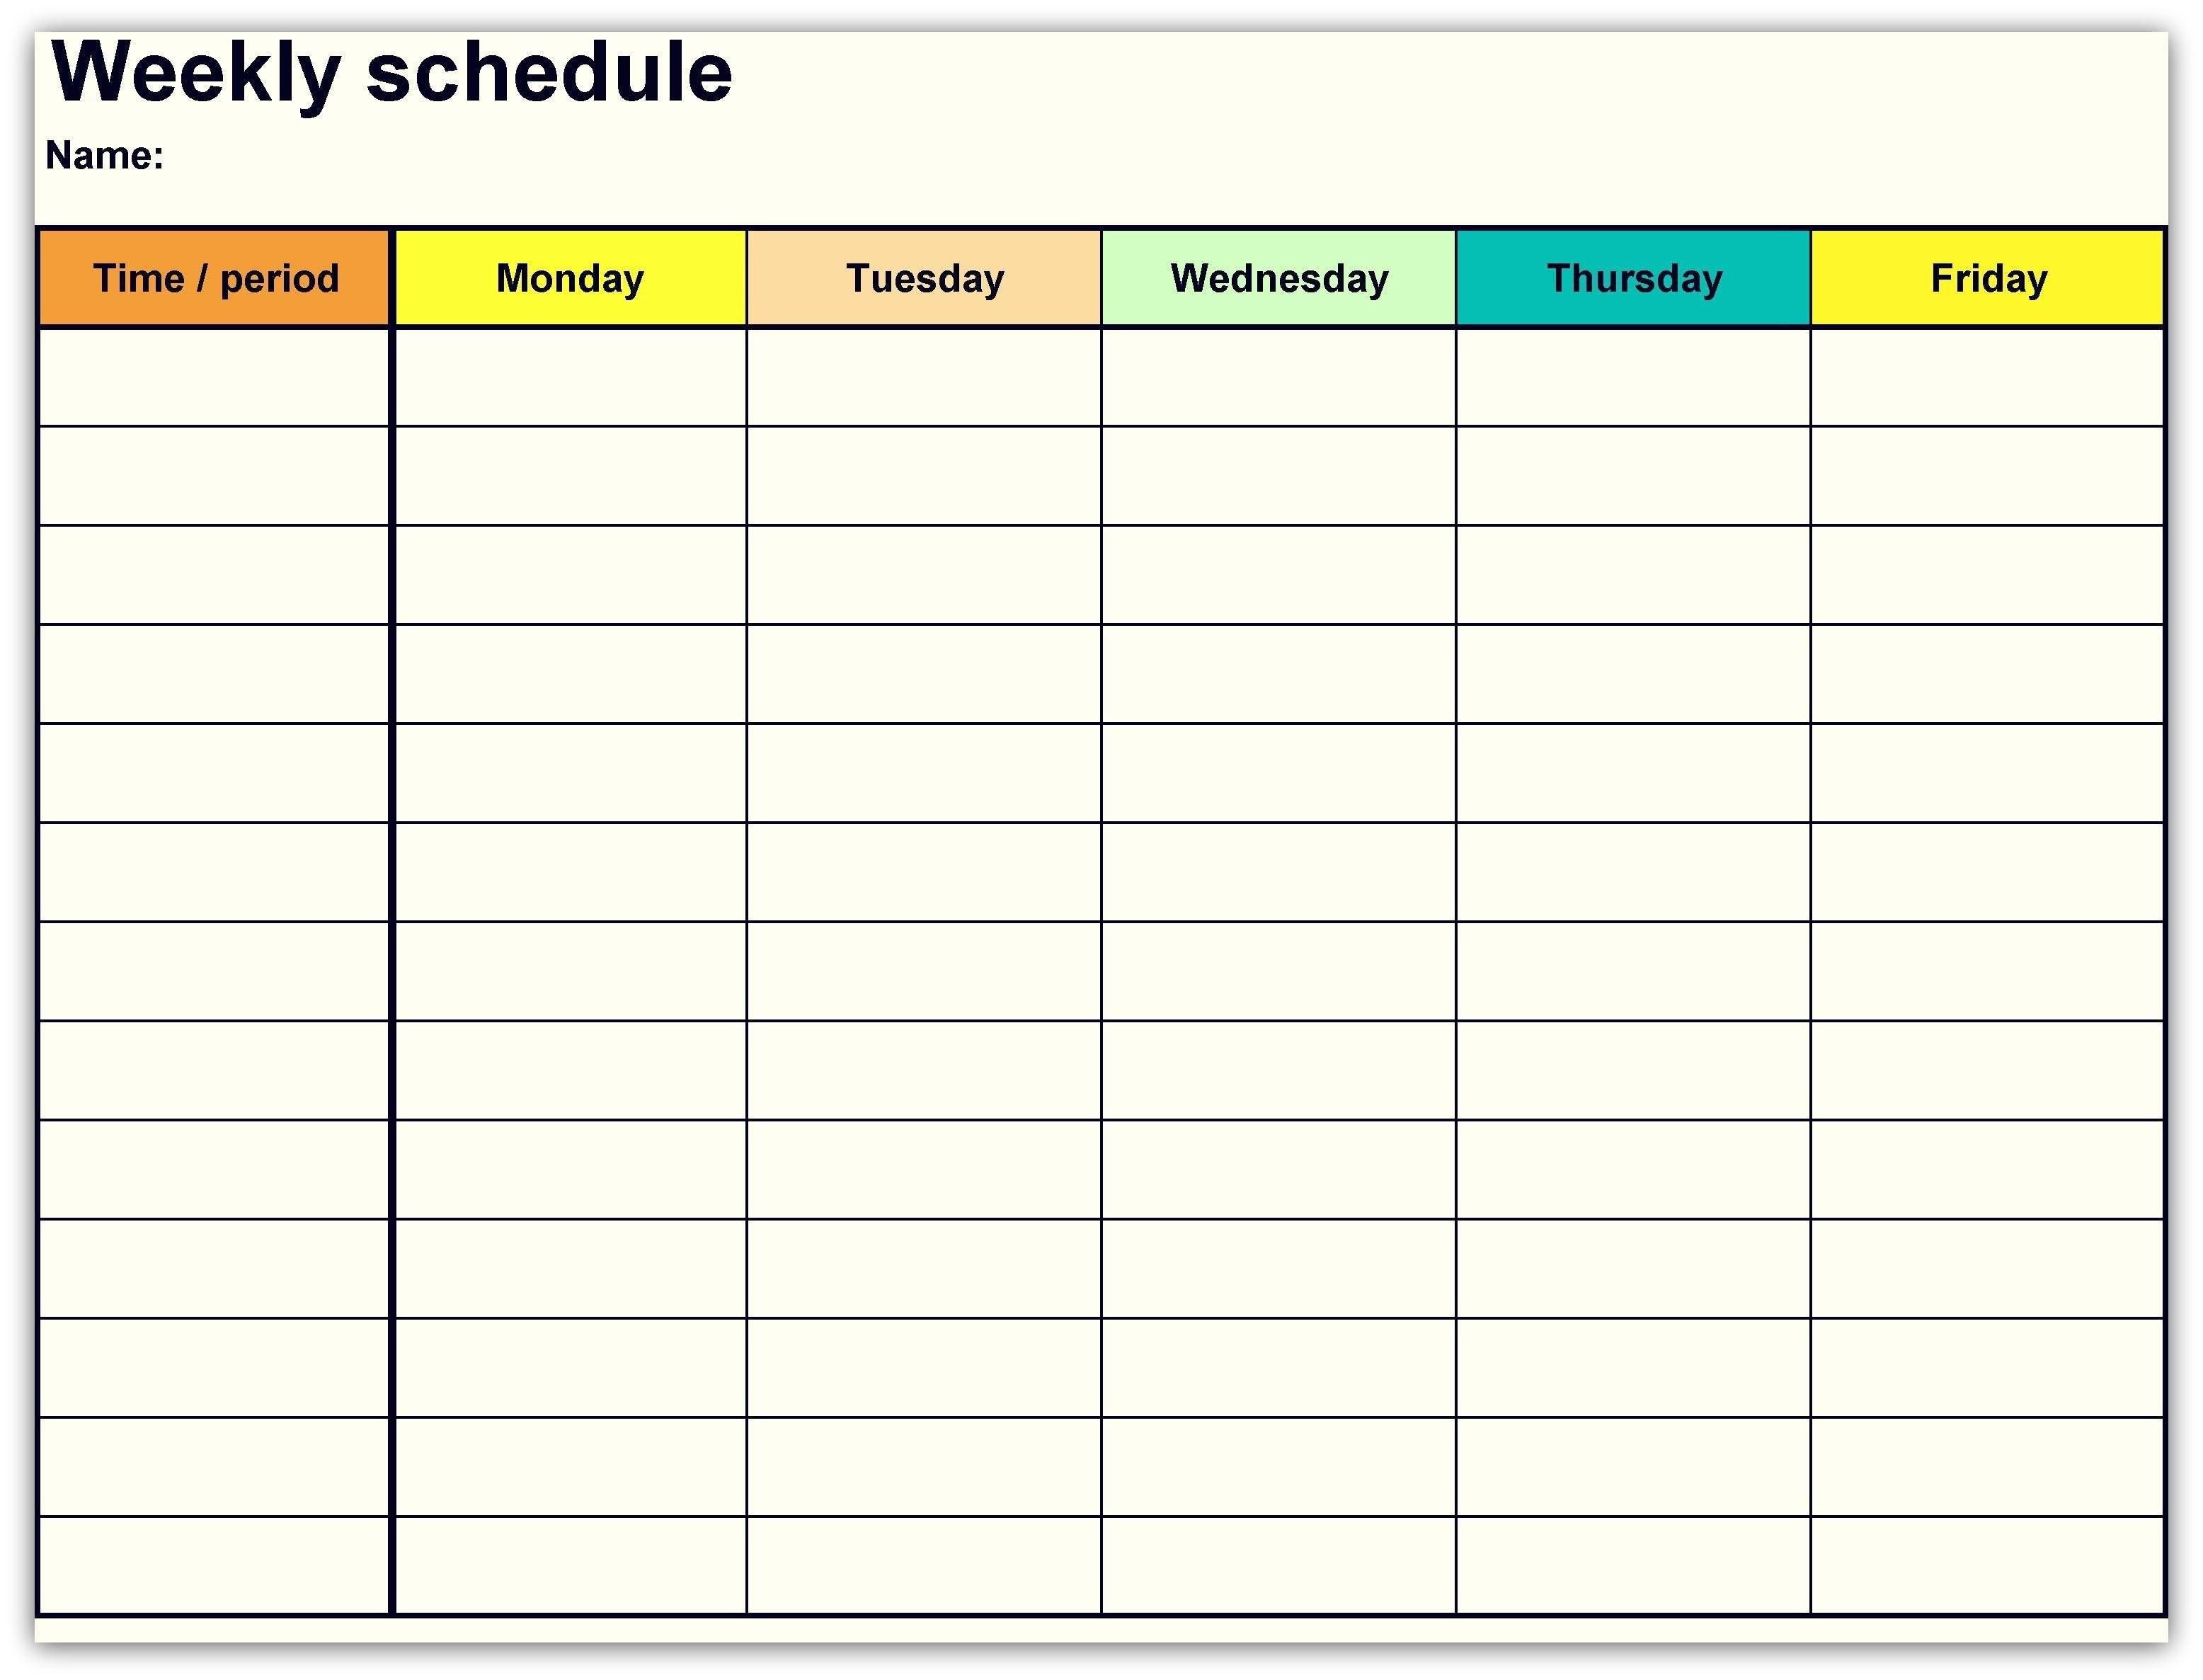 Material Involved With Calendar 2019 Hong Kong Excel – Calendar Calendar 2019 Excel Hong Kong